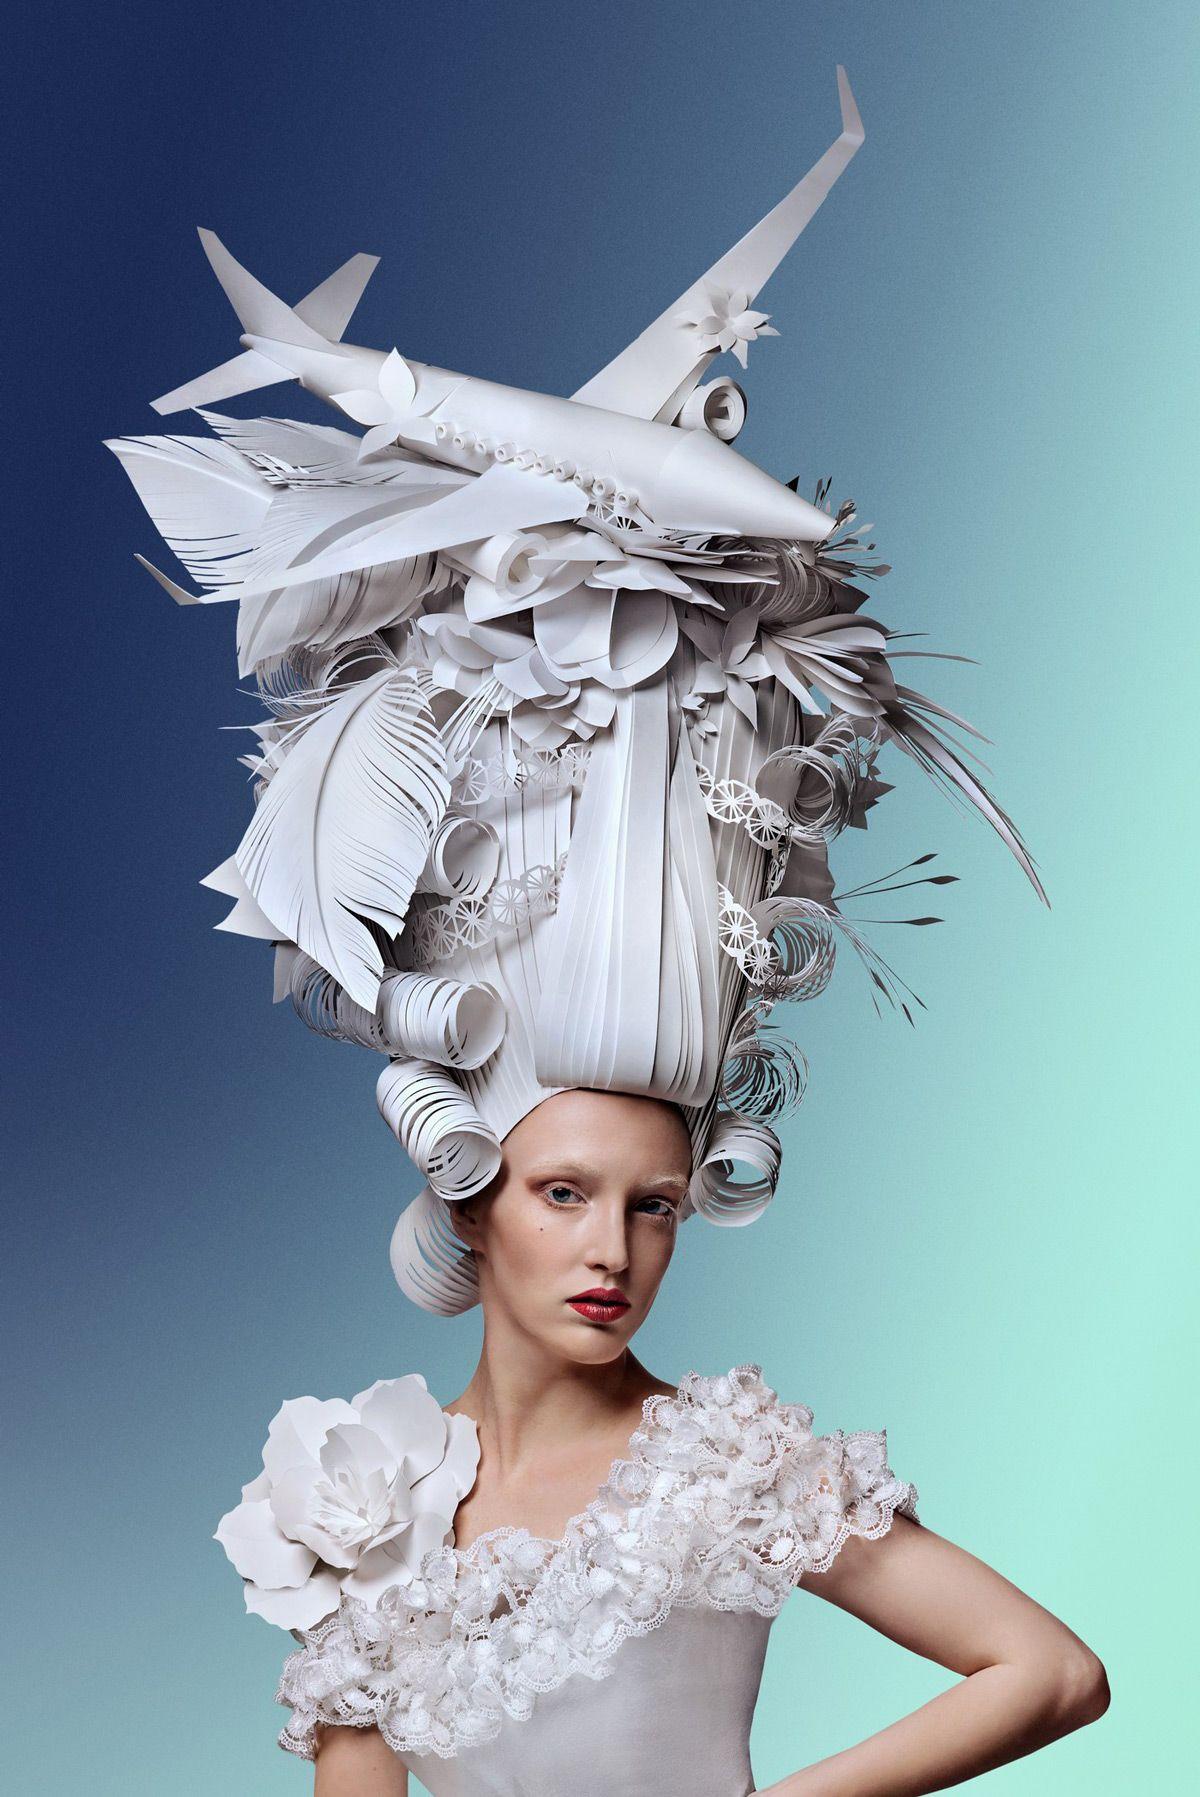 Paper artist Asya Kozina was inspired by